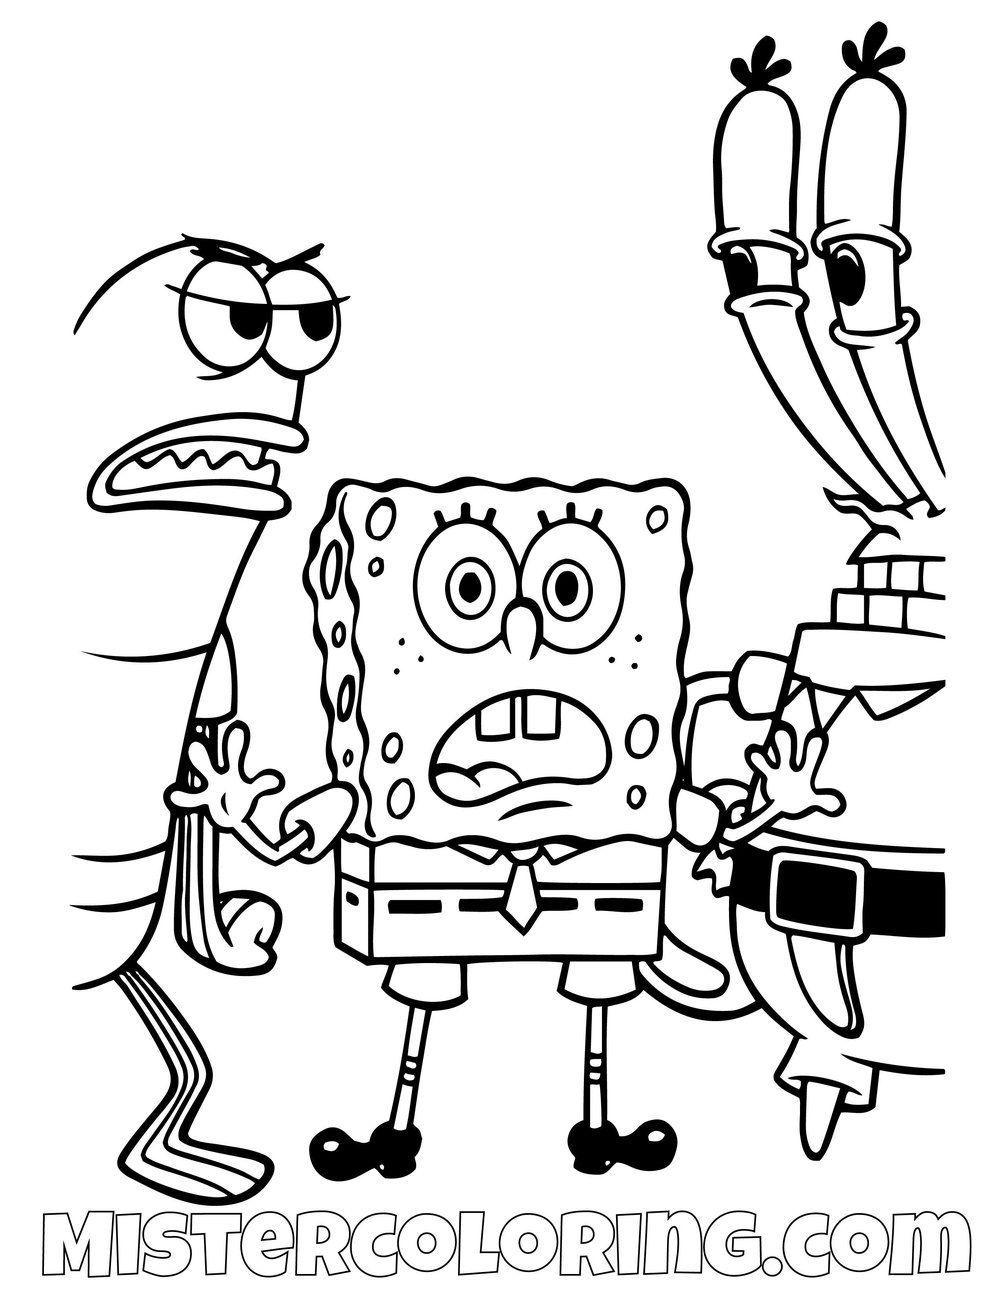 Spongebob Separating A Fight Spongebob Squarepants Coloring Pages For Kids Kleurplaten Voor Kinderen Spongebob Squarepants Kleurplaten